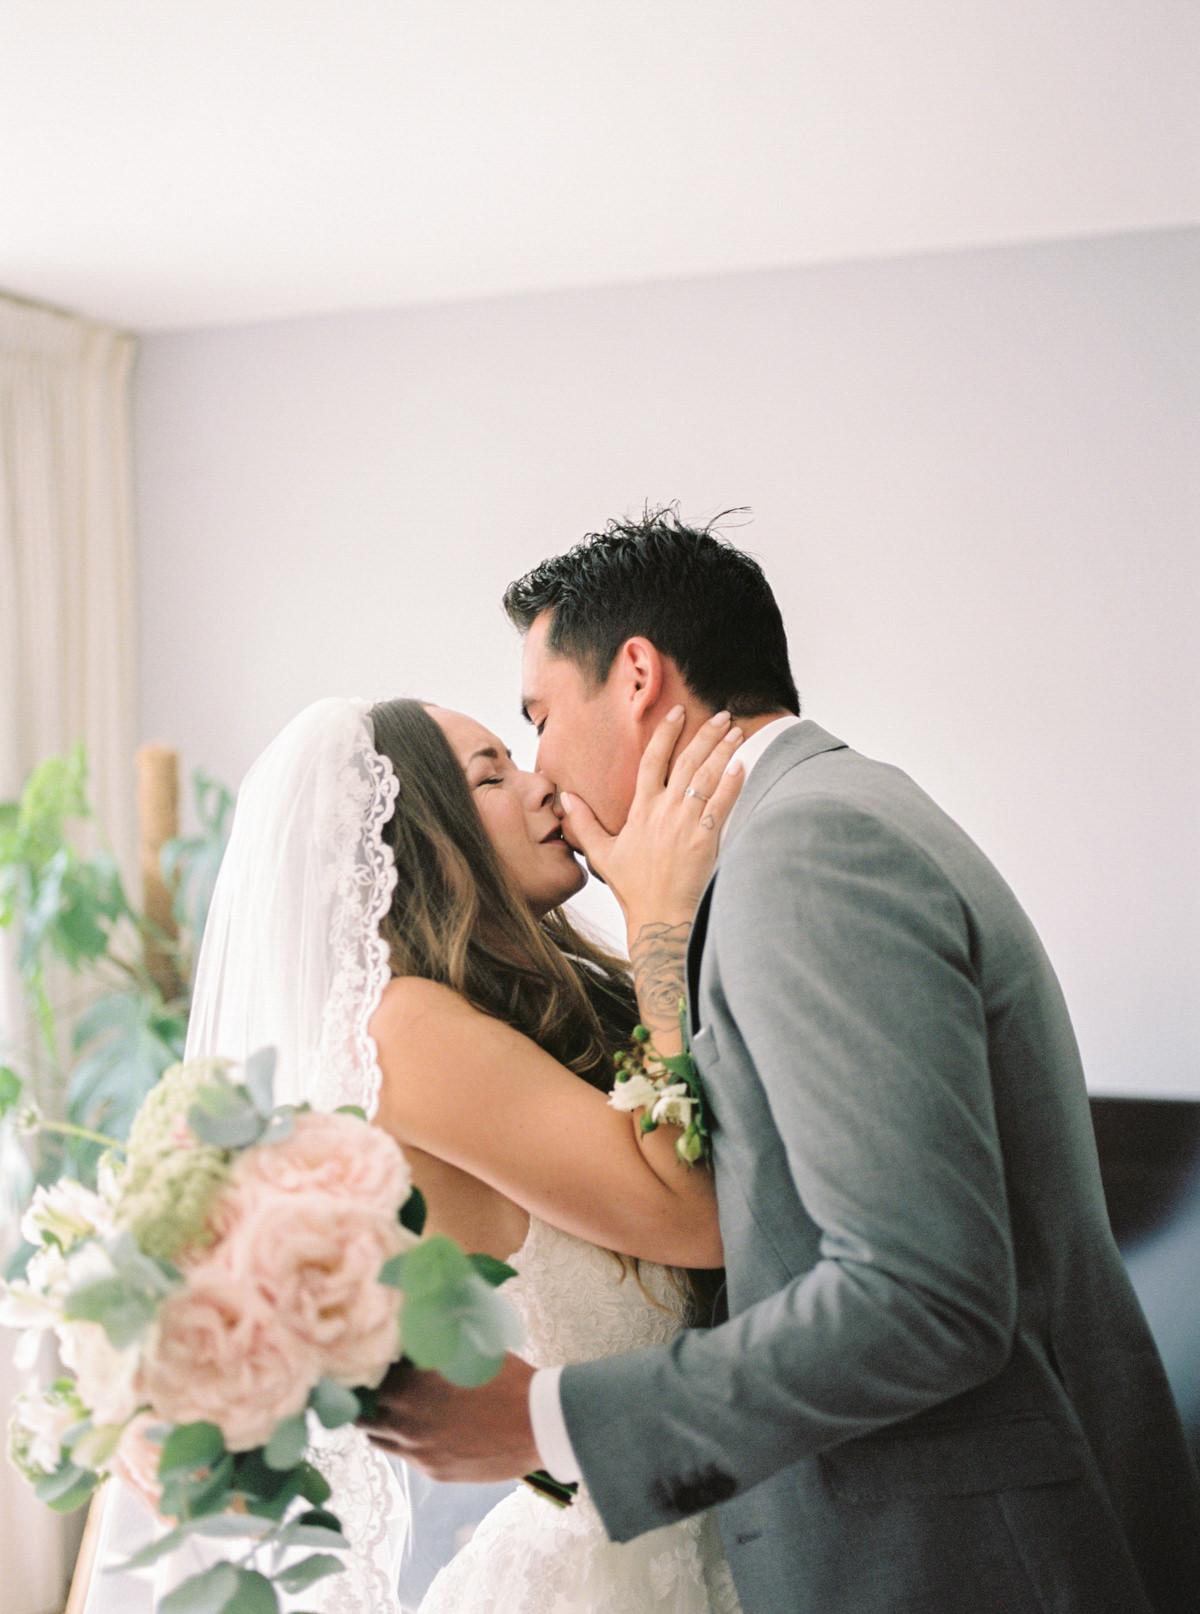 CHYMO_MORE_Photography_romantic_fine_art_wedding_groot_warnsborn